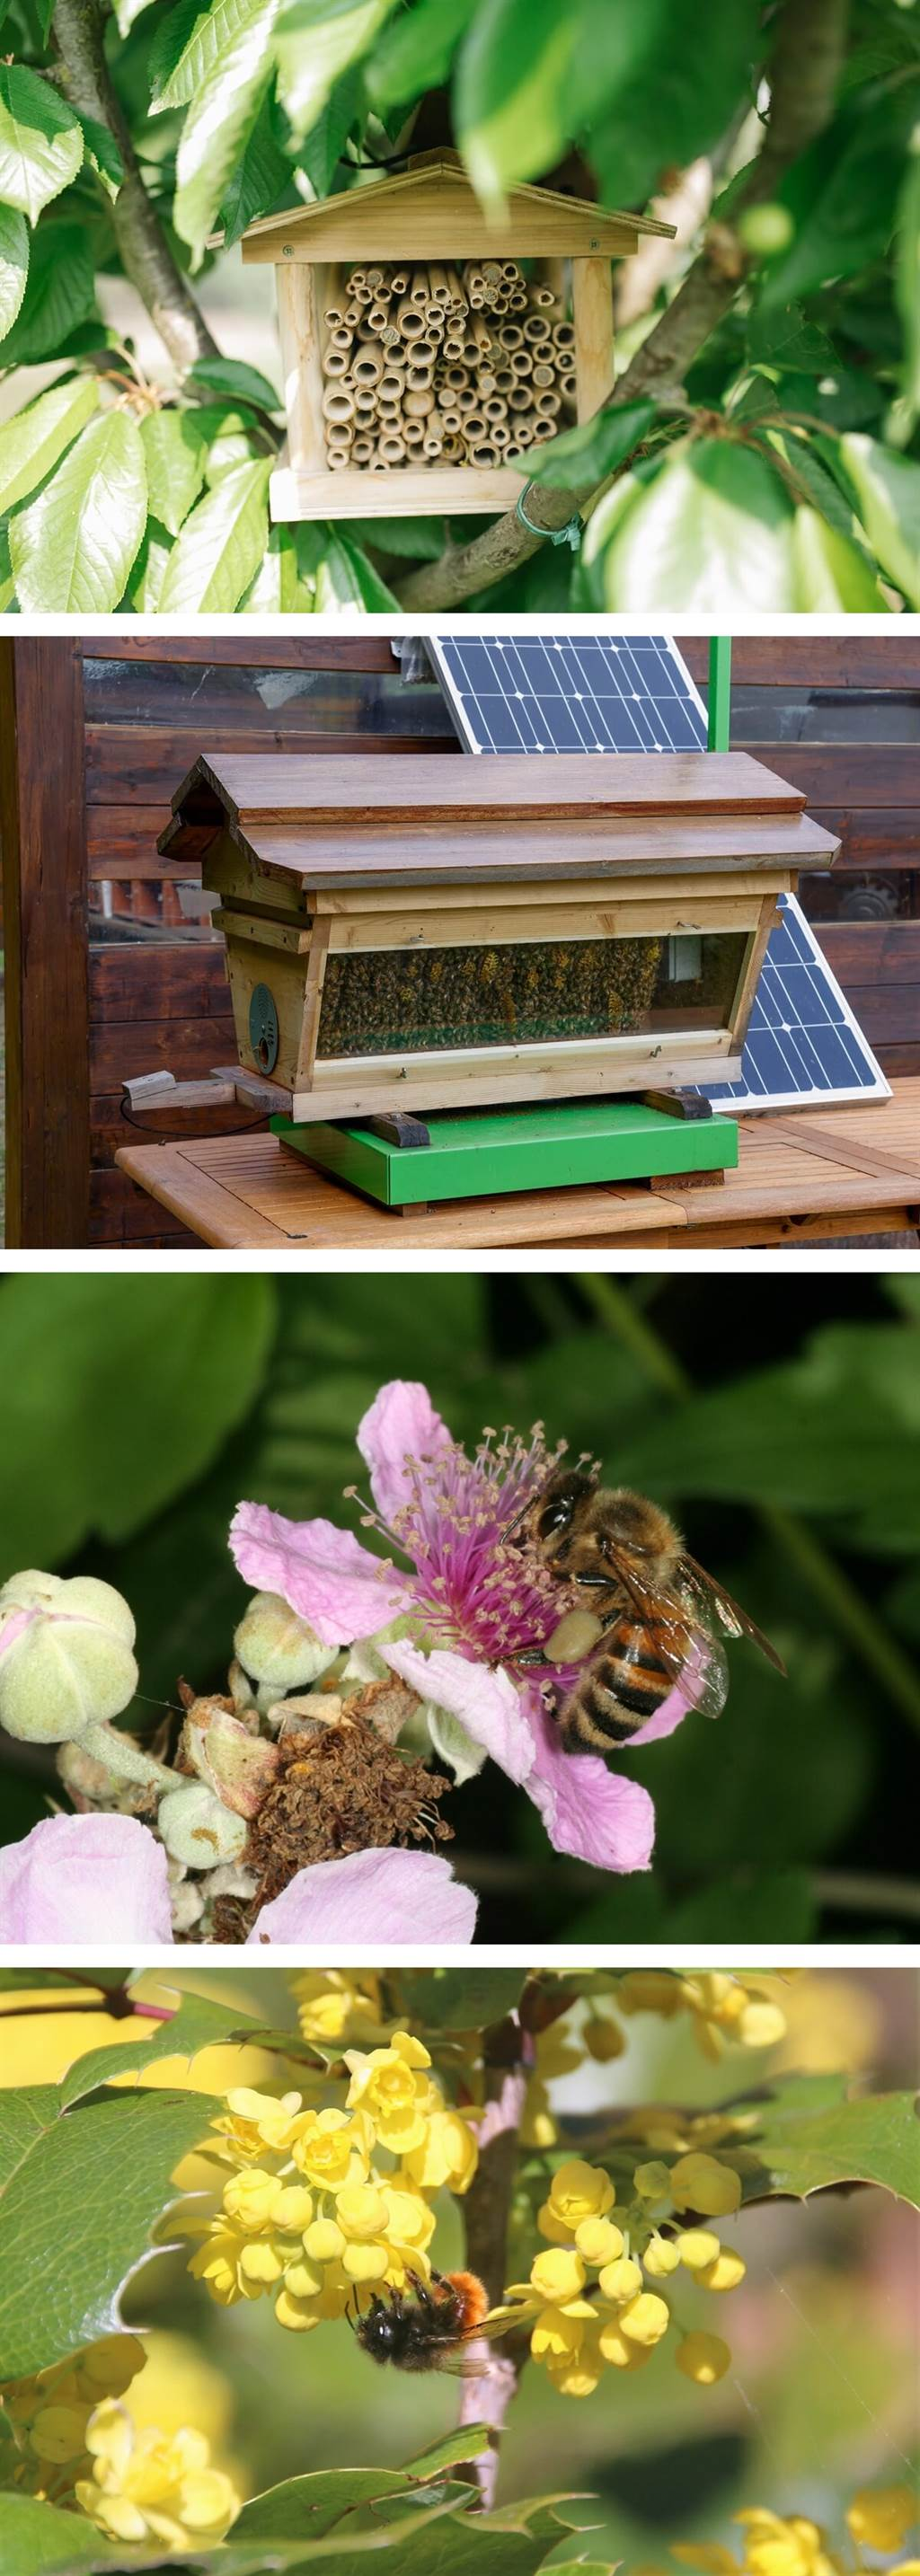 Lamborghini以60萬隻蜜蜂和新「科技蜂巢」慶祝世界蜜蜂日